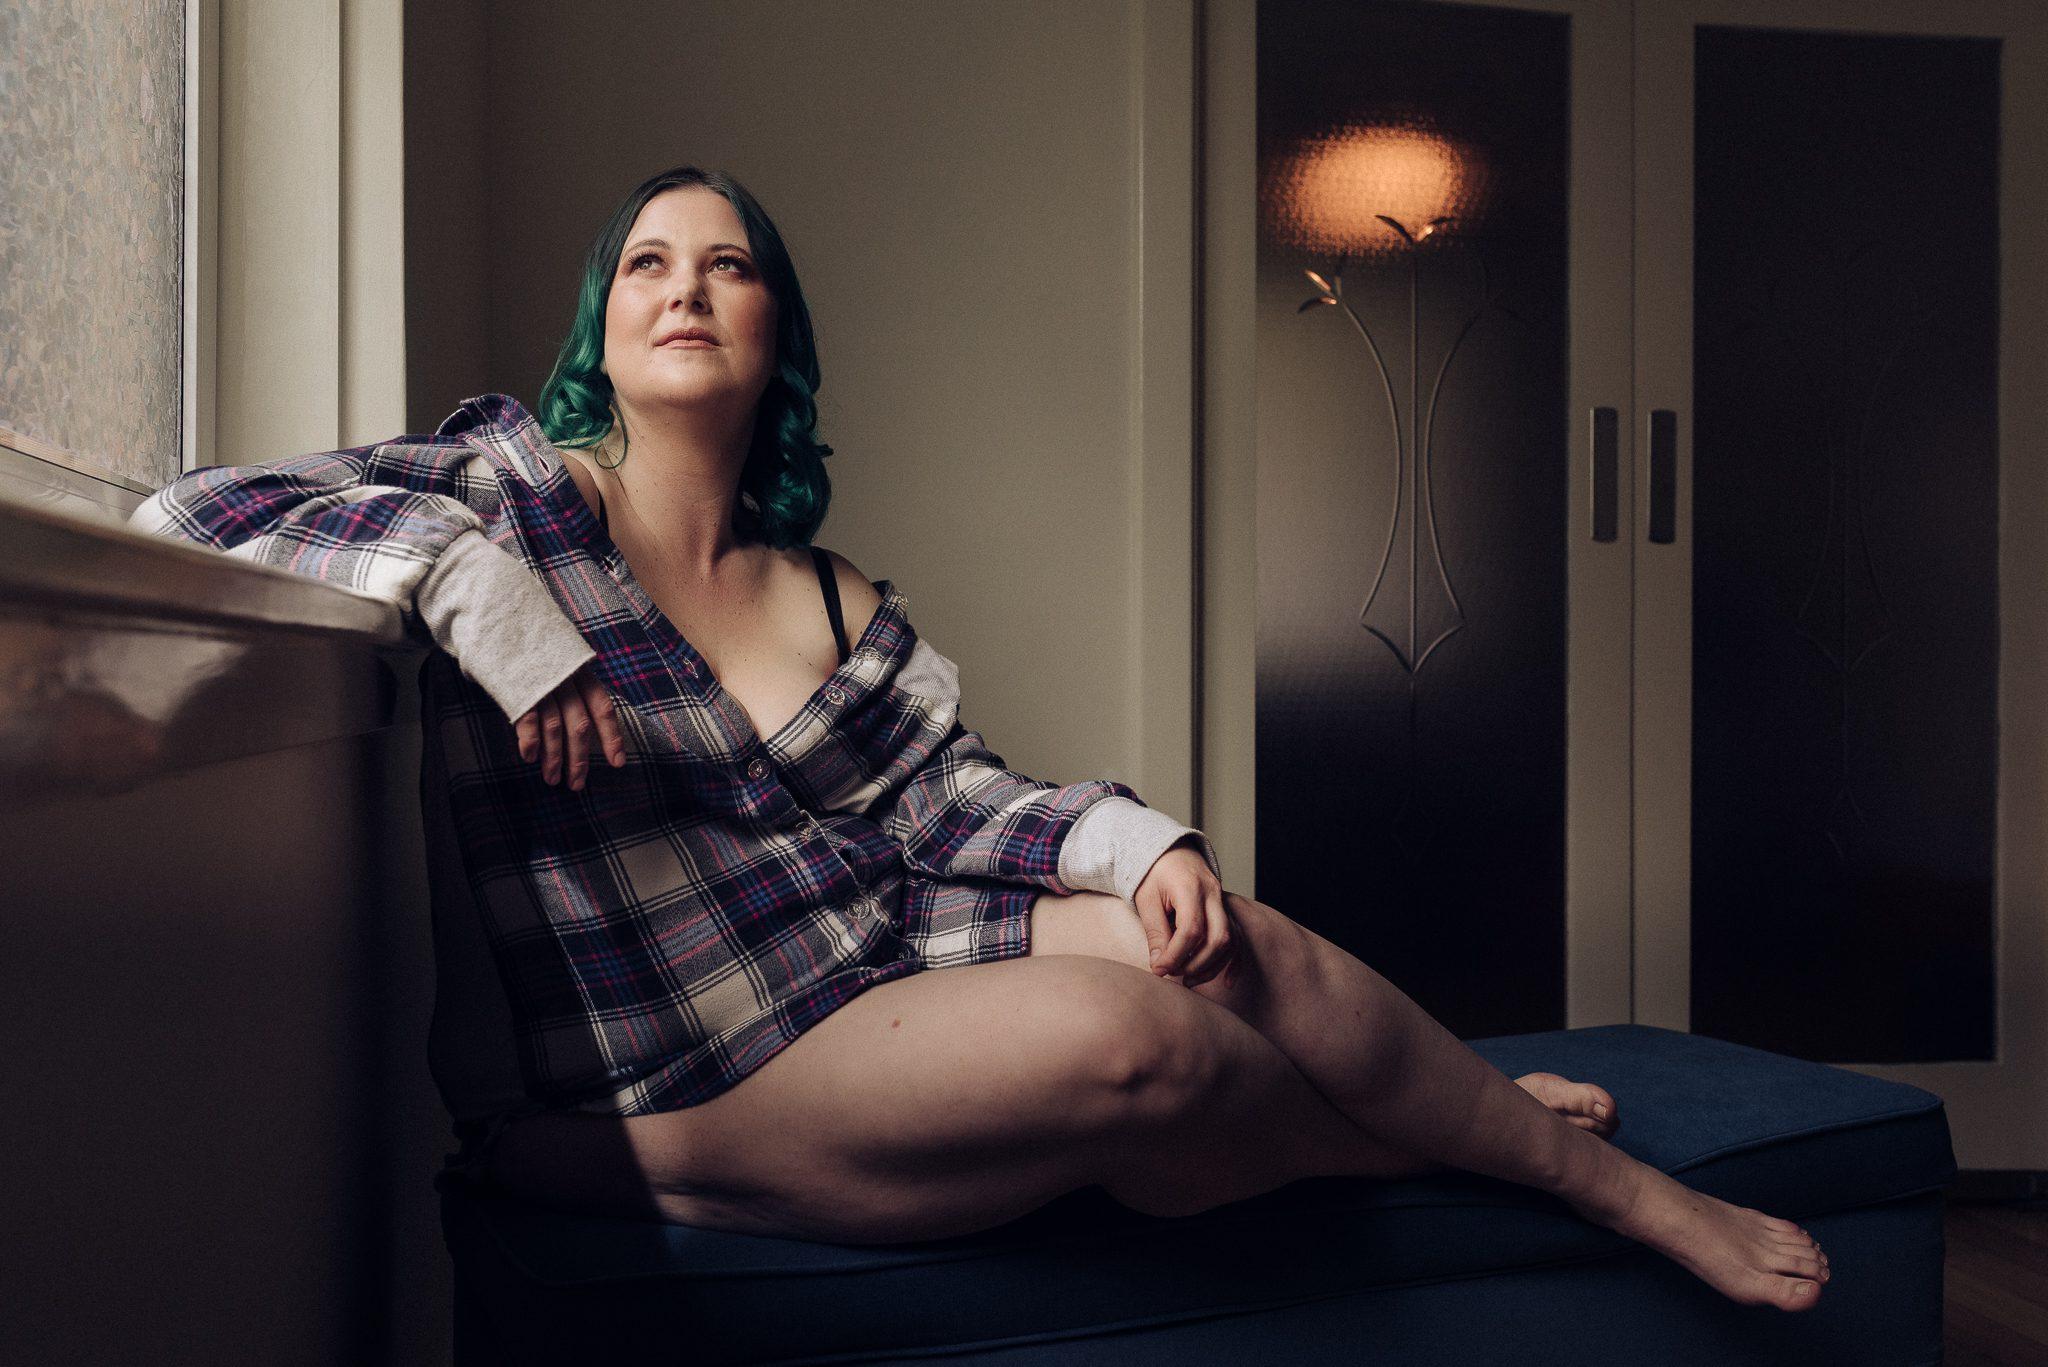 Boudoir portrait of a woman in a tartan shirt